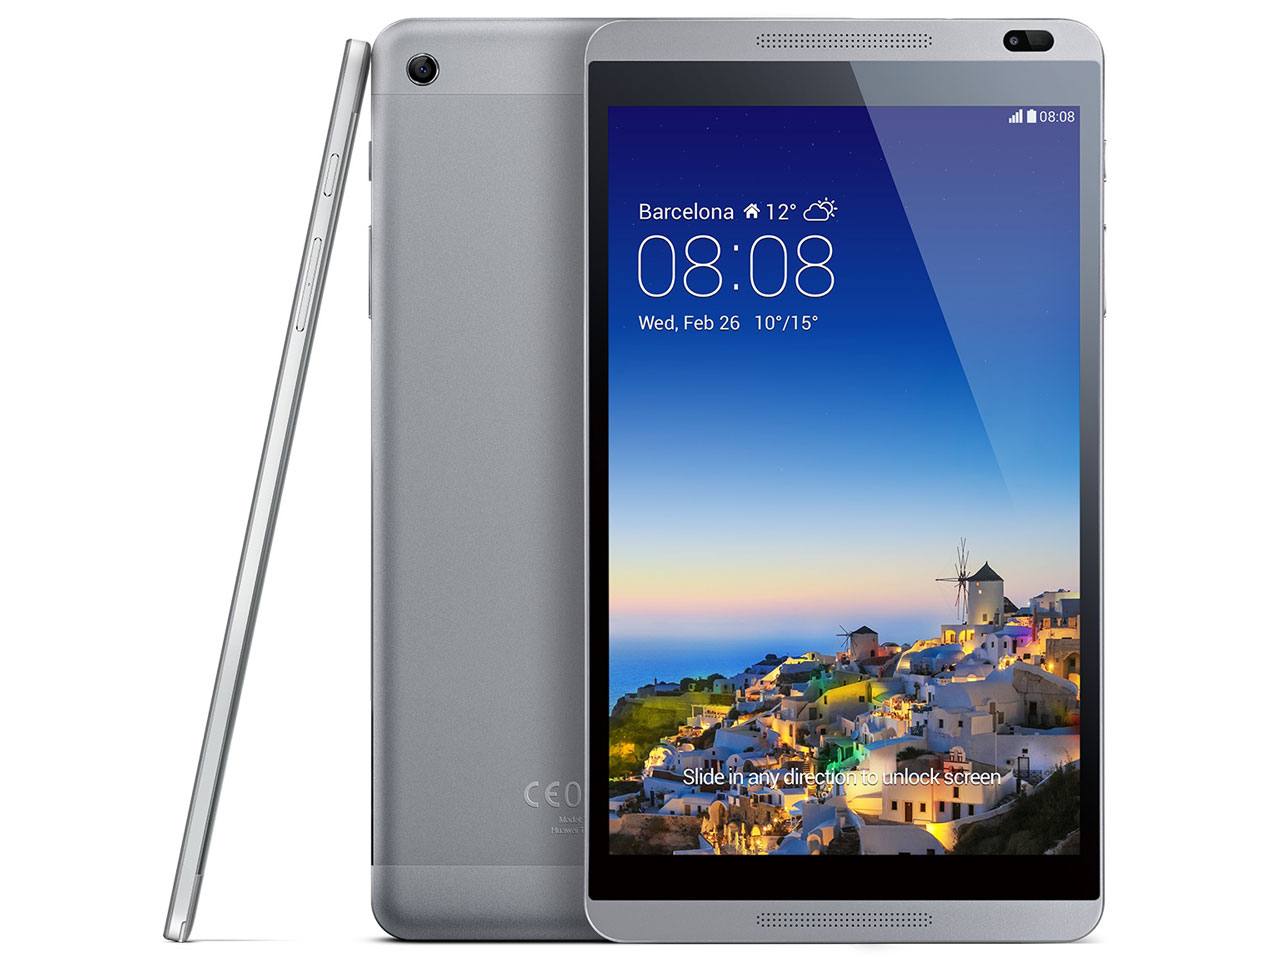 MediaPad M1 8.0 LTEモデル SIMフリー [チタニウムグレー] の製品画像